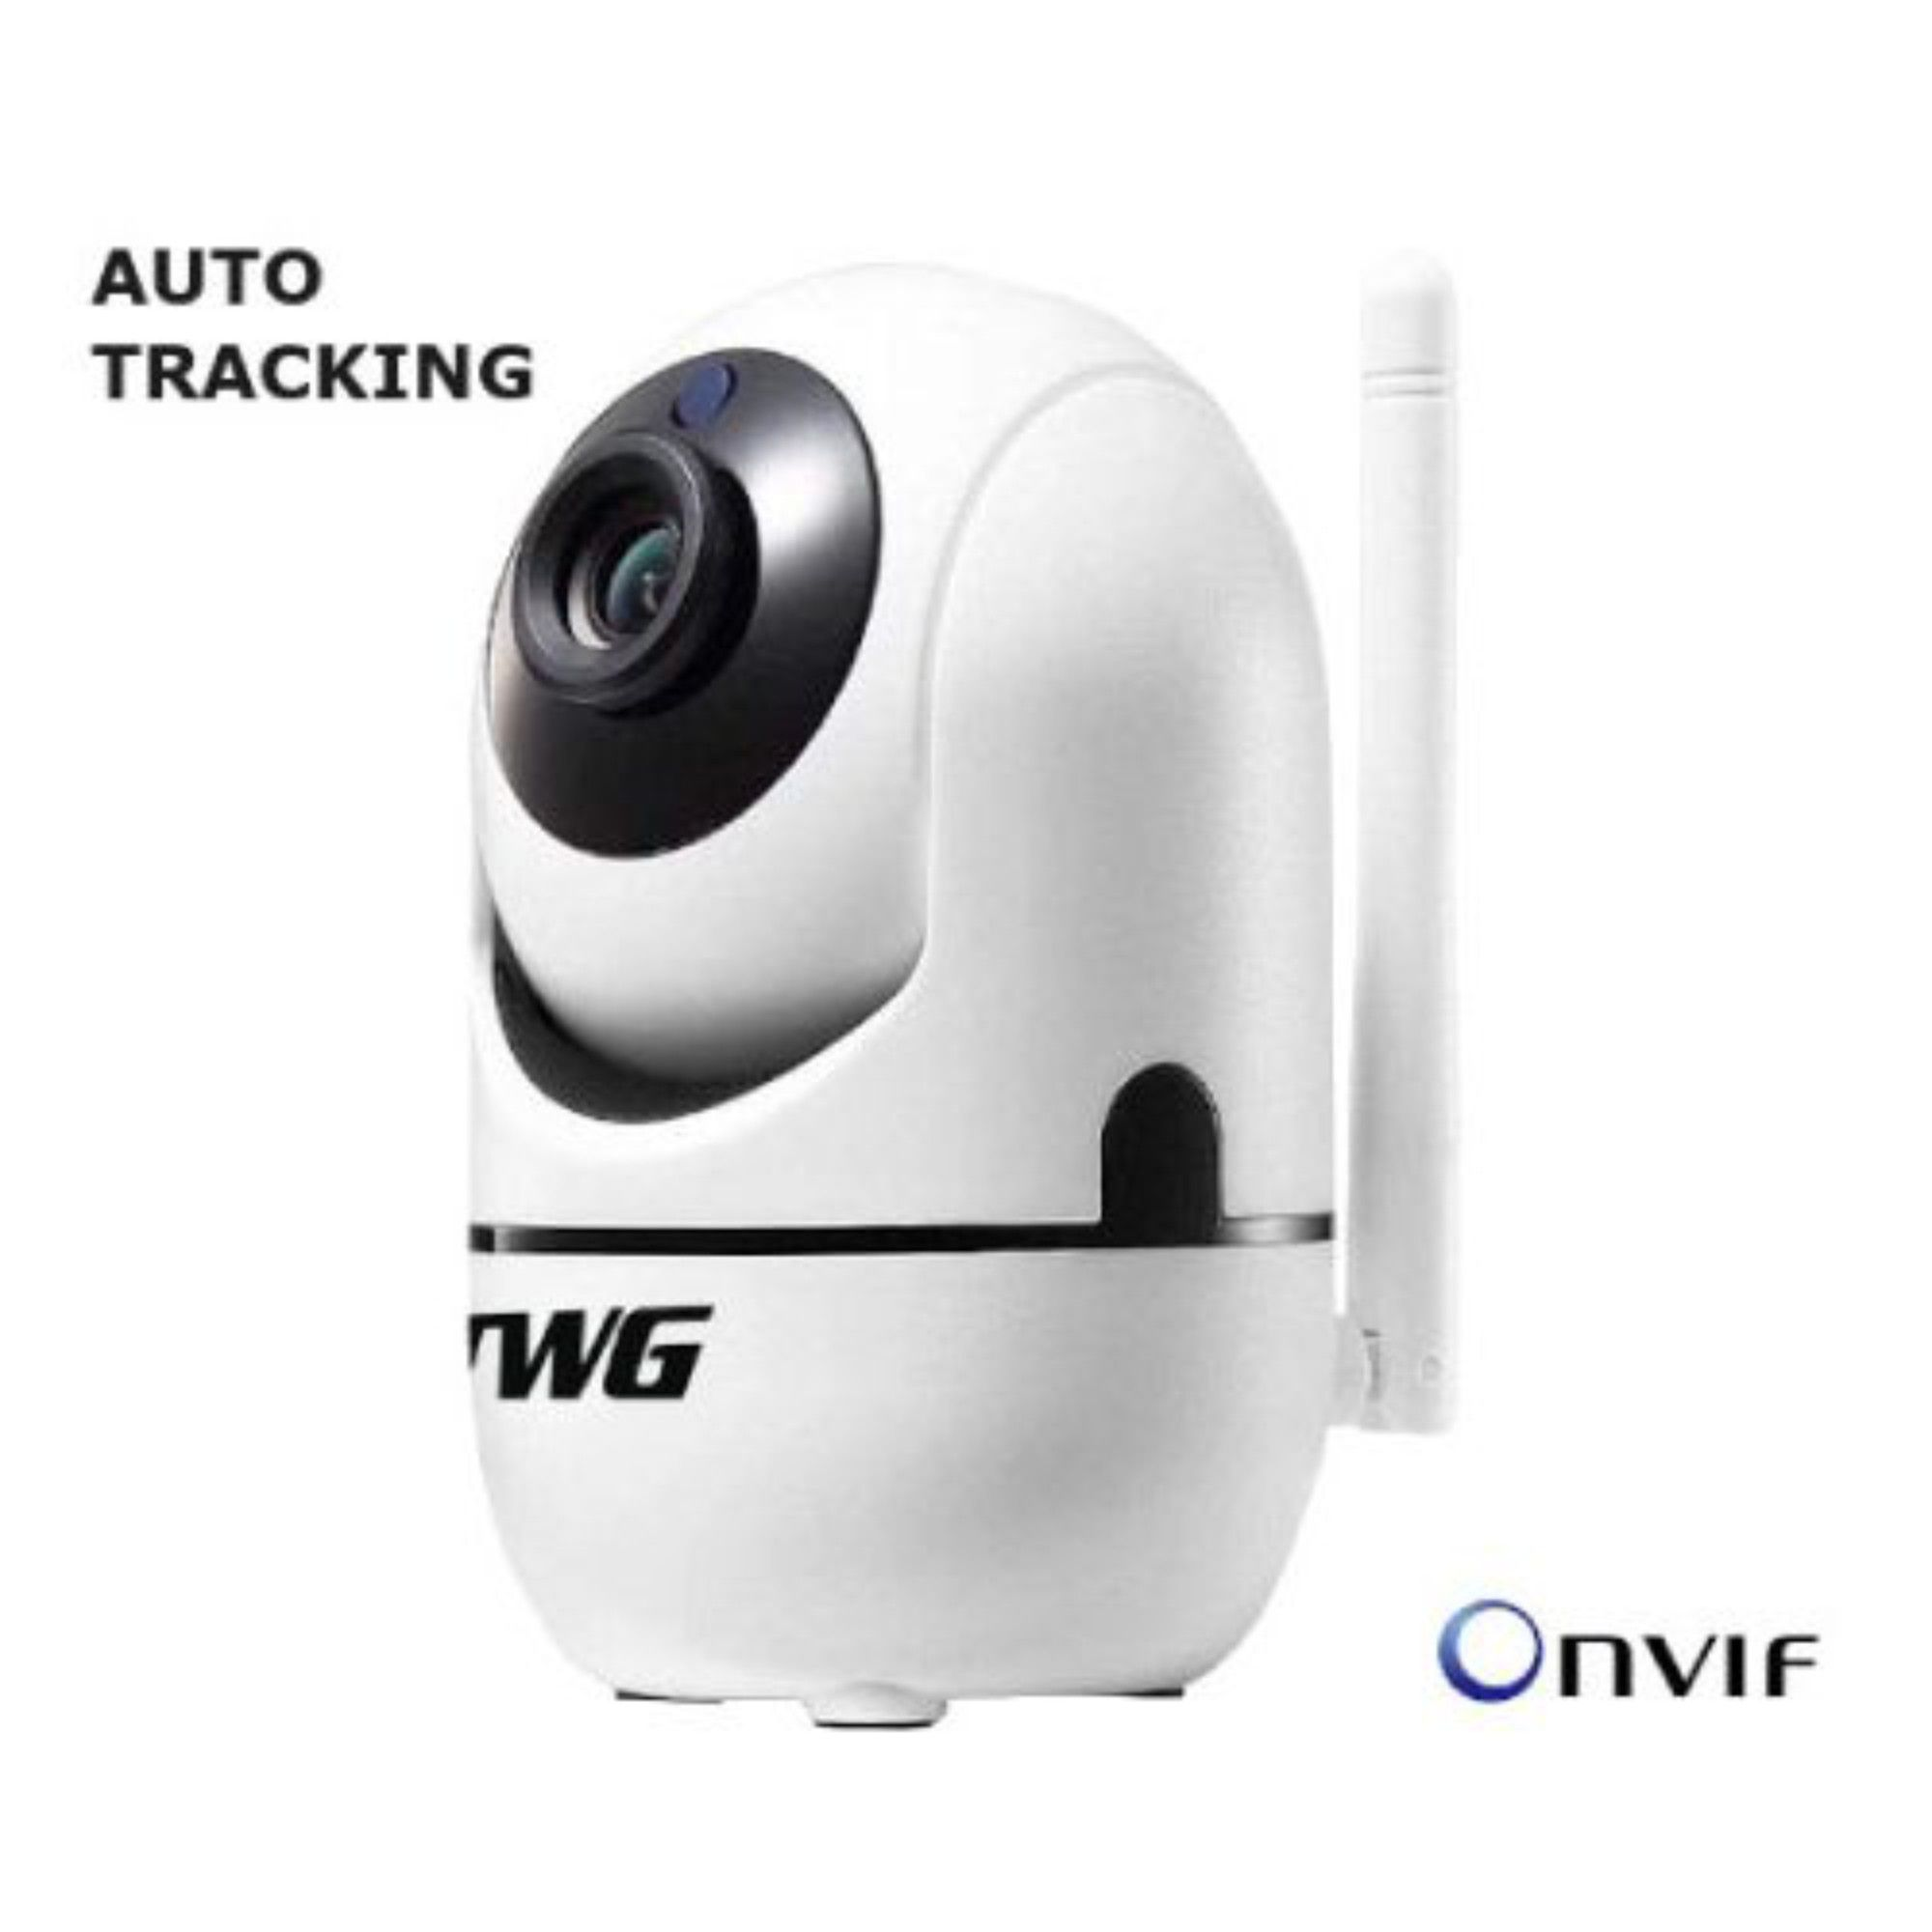 Câmera Inteligente Robô Wifi Onvif C/ Auto Tracking 720p 1mp TWG